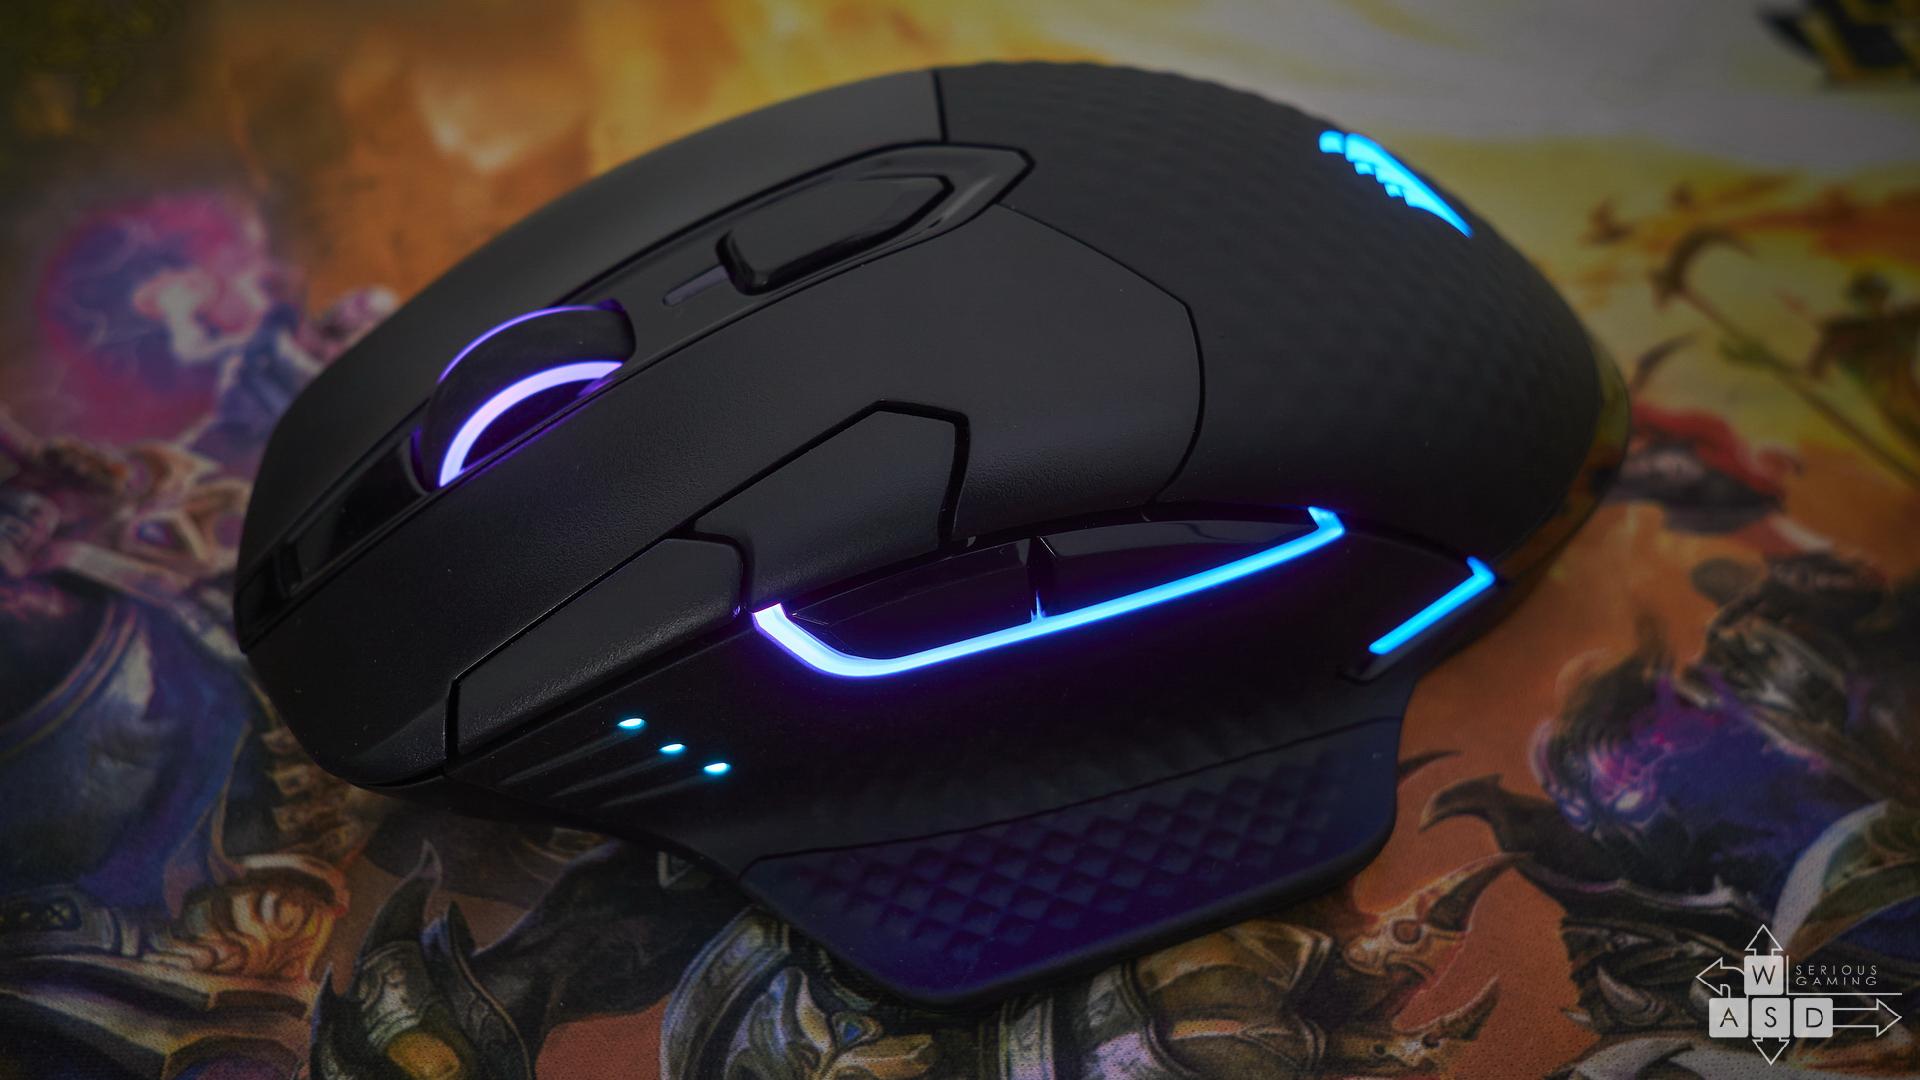 Corsair Dark Core RGB Pro review | WASD